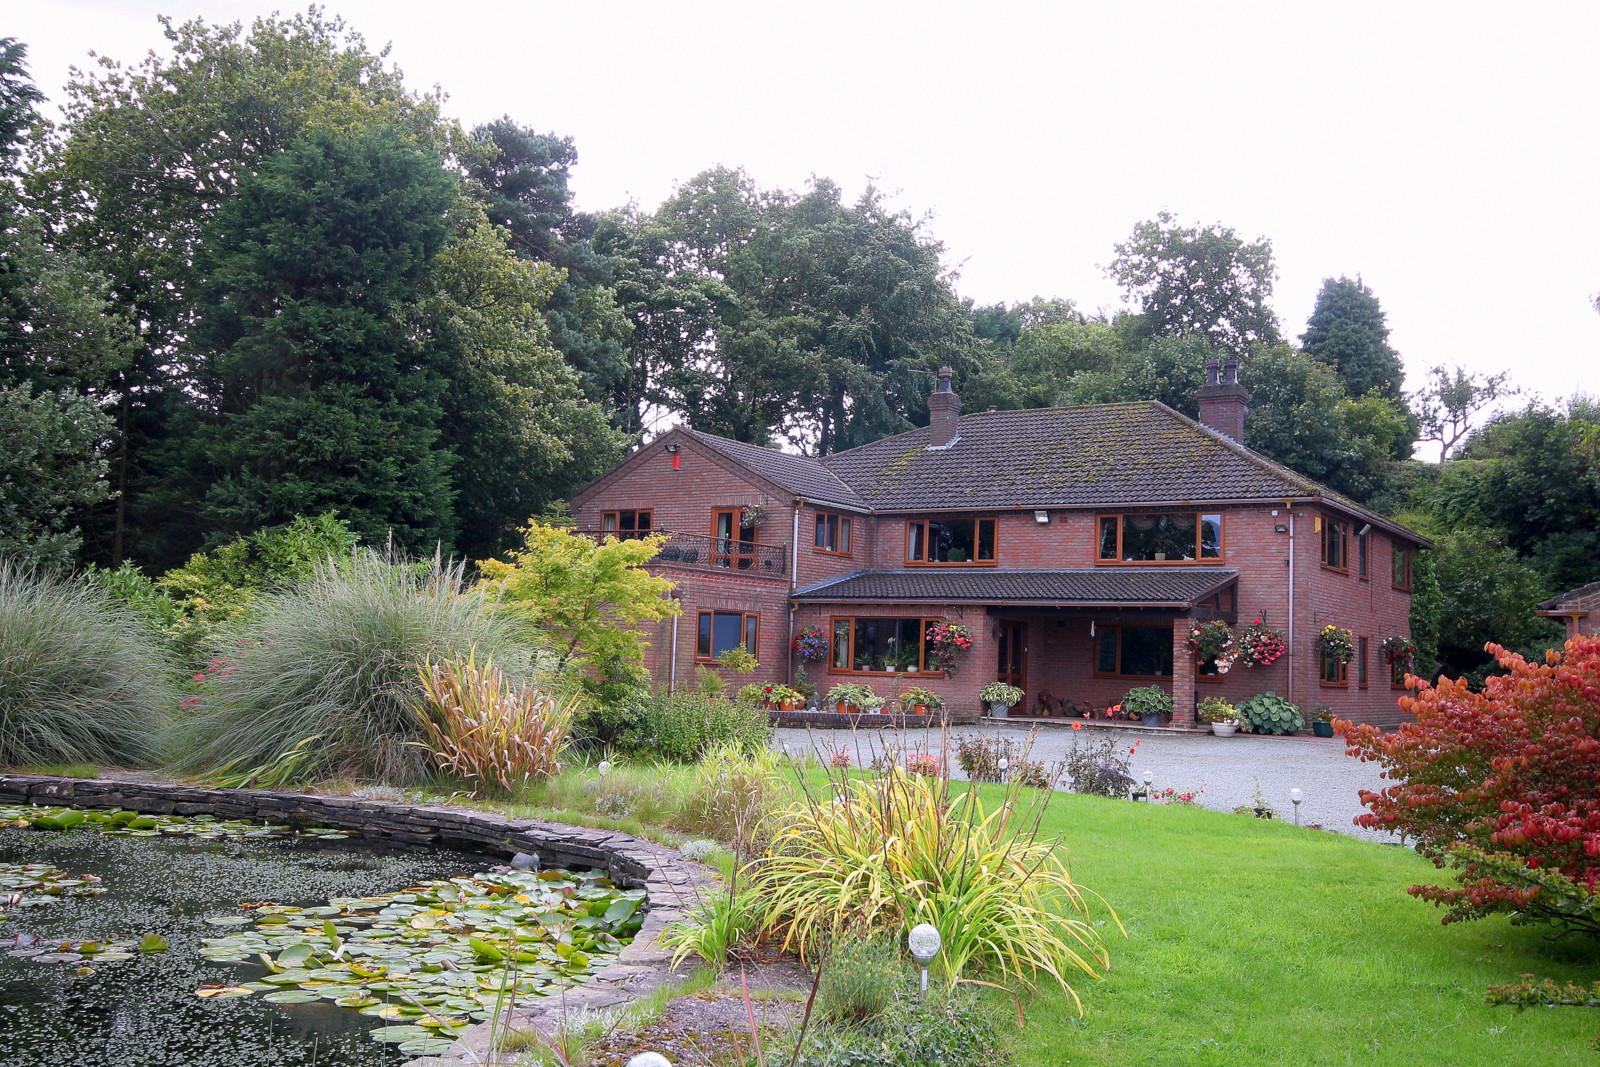 4 Bedroom House For Sale In Market Drayton